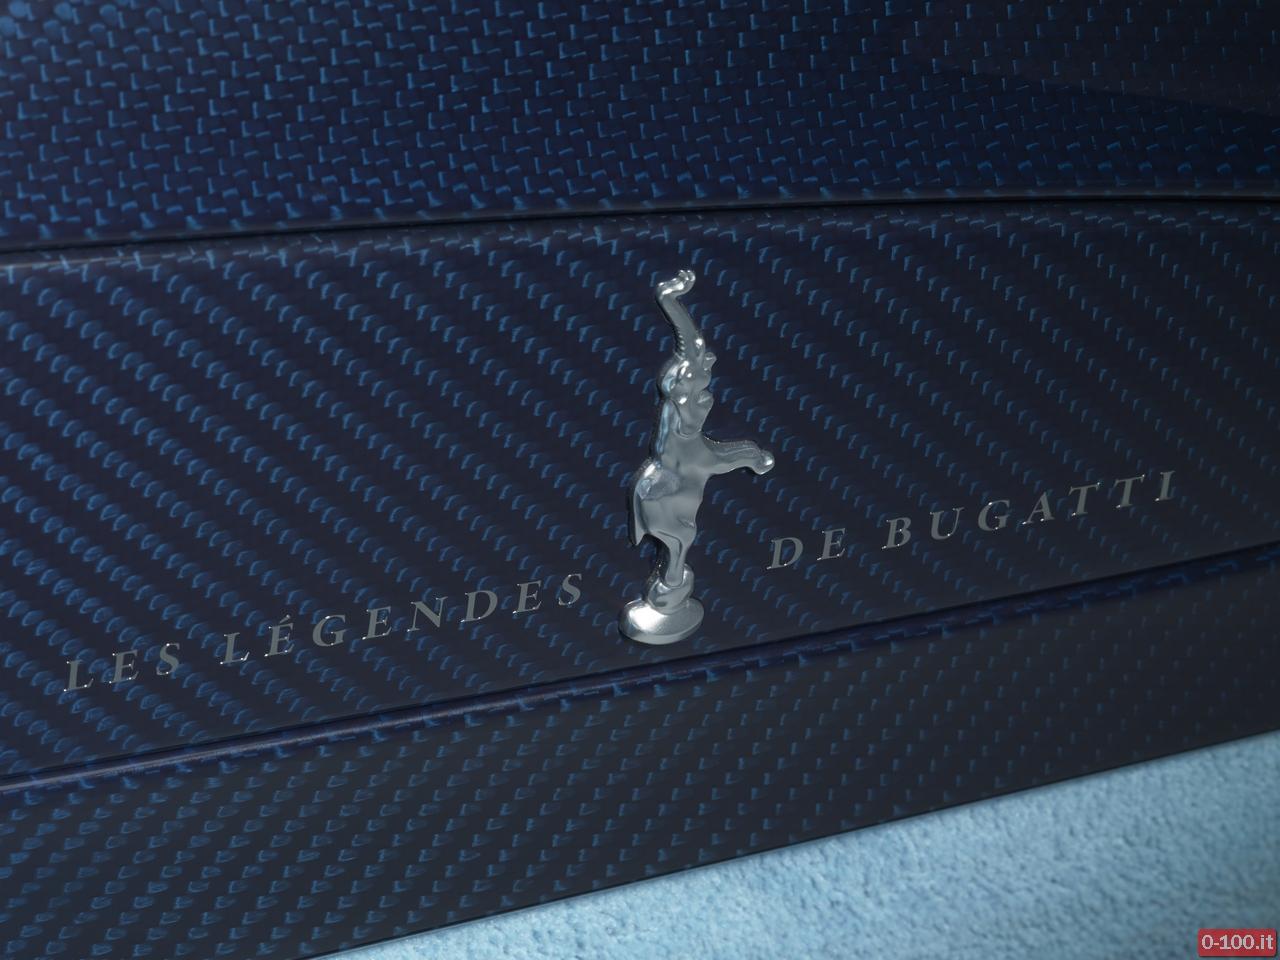 Bugatti-Veyron-16.4-Grand Sport-Vitesse-six-part-Legends-jean-pierre-wimille-57g-tank_0-100_26